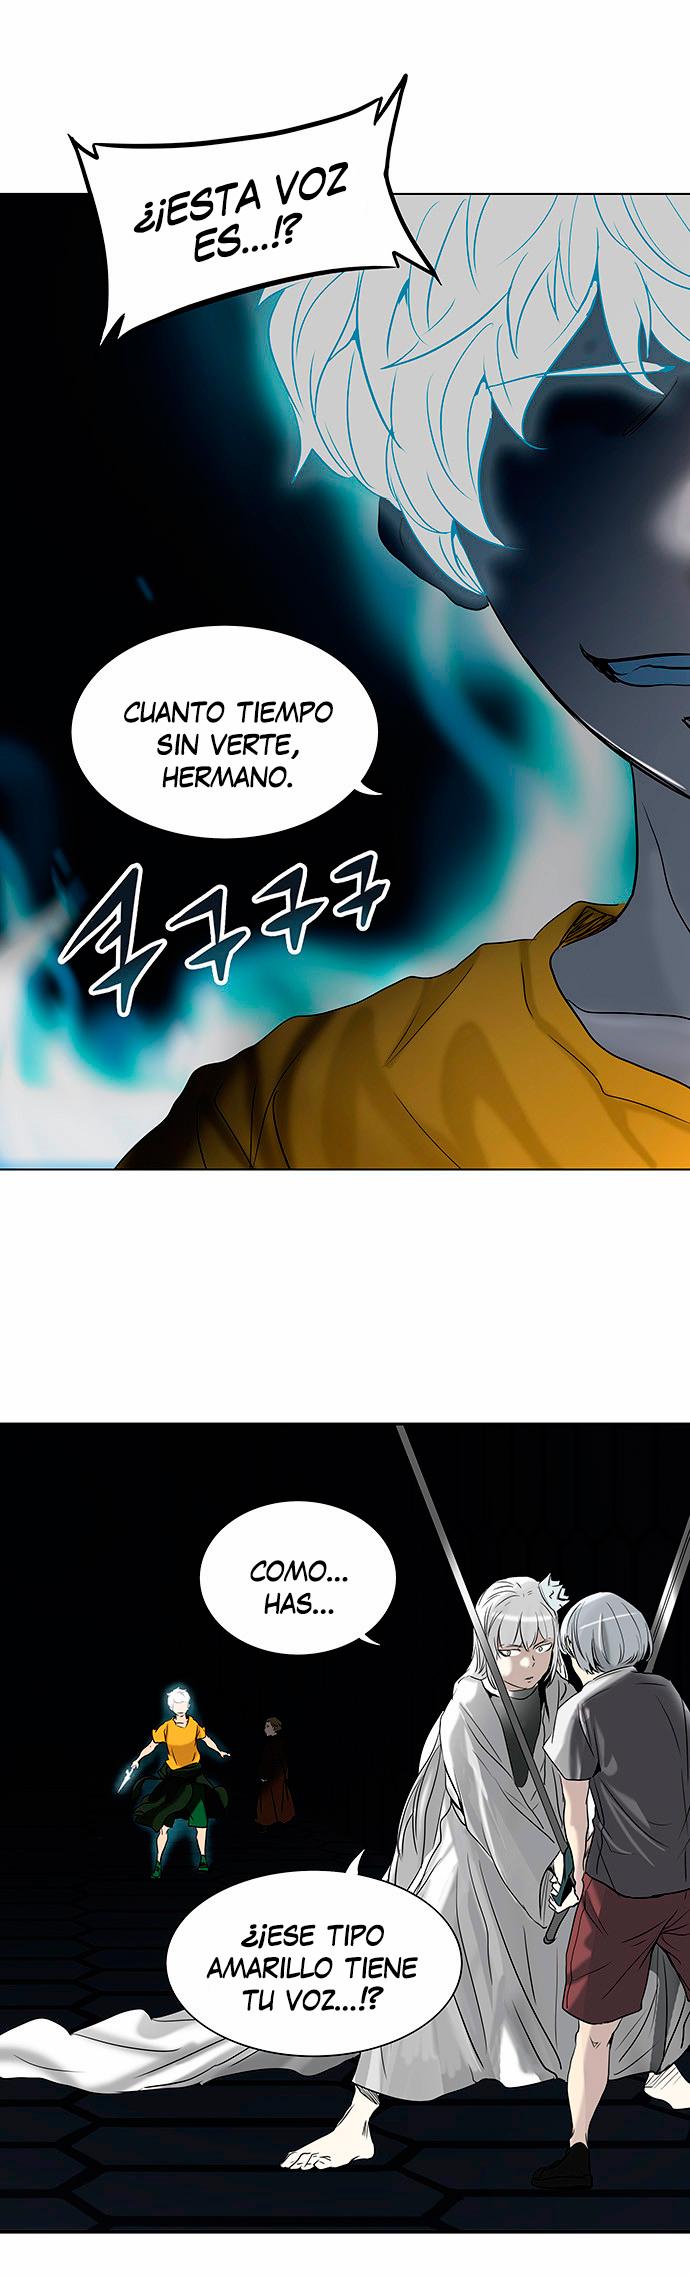 http://c5.ninemanga.com/es_manga/21/149/434989/a080c3b21aced9b1f9832871cdf4a381.jpg Page 2